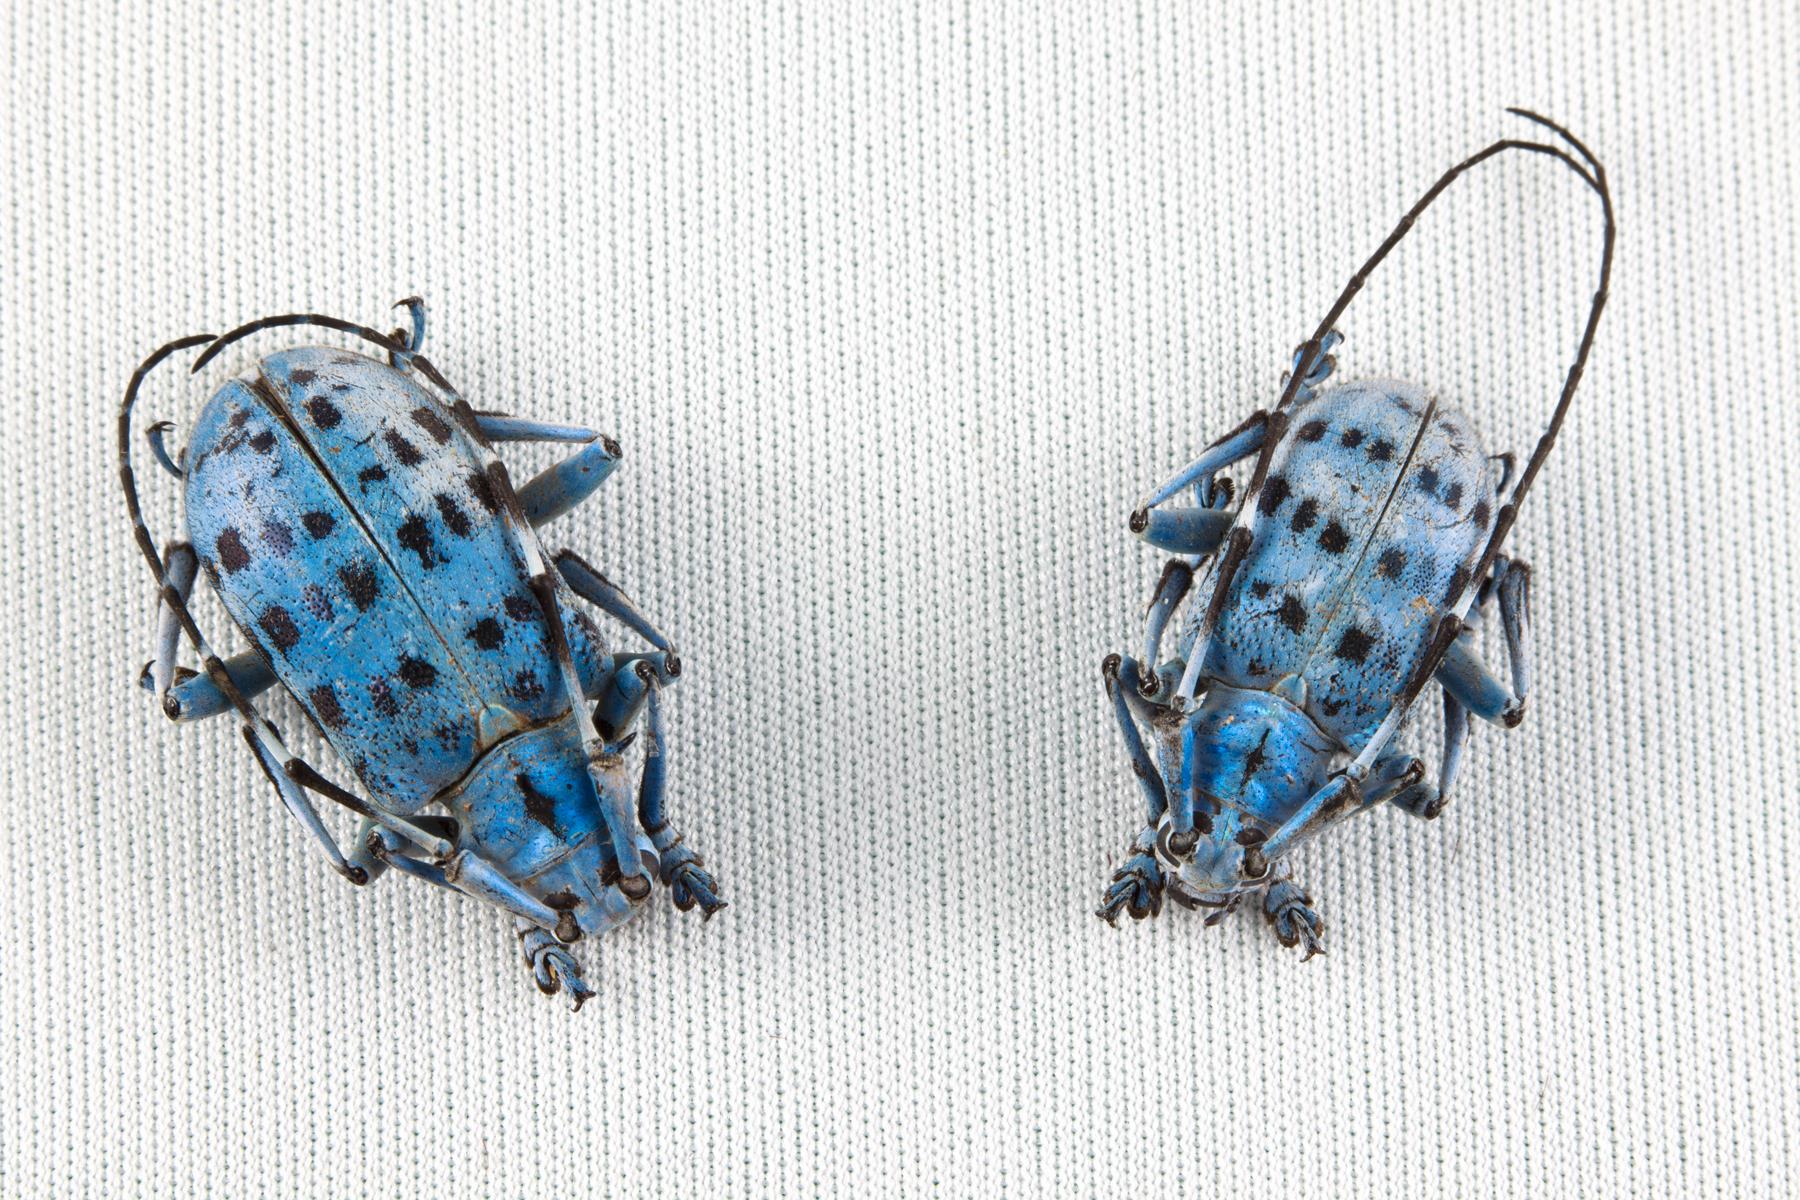 Pseudomyagrus Waterhousei Beetles, Animal, Insects, Isolated, Isolation, HQ Photo